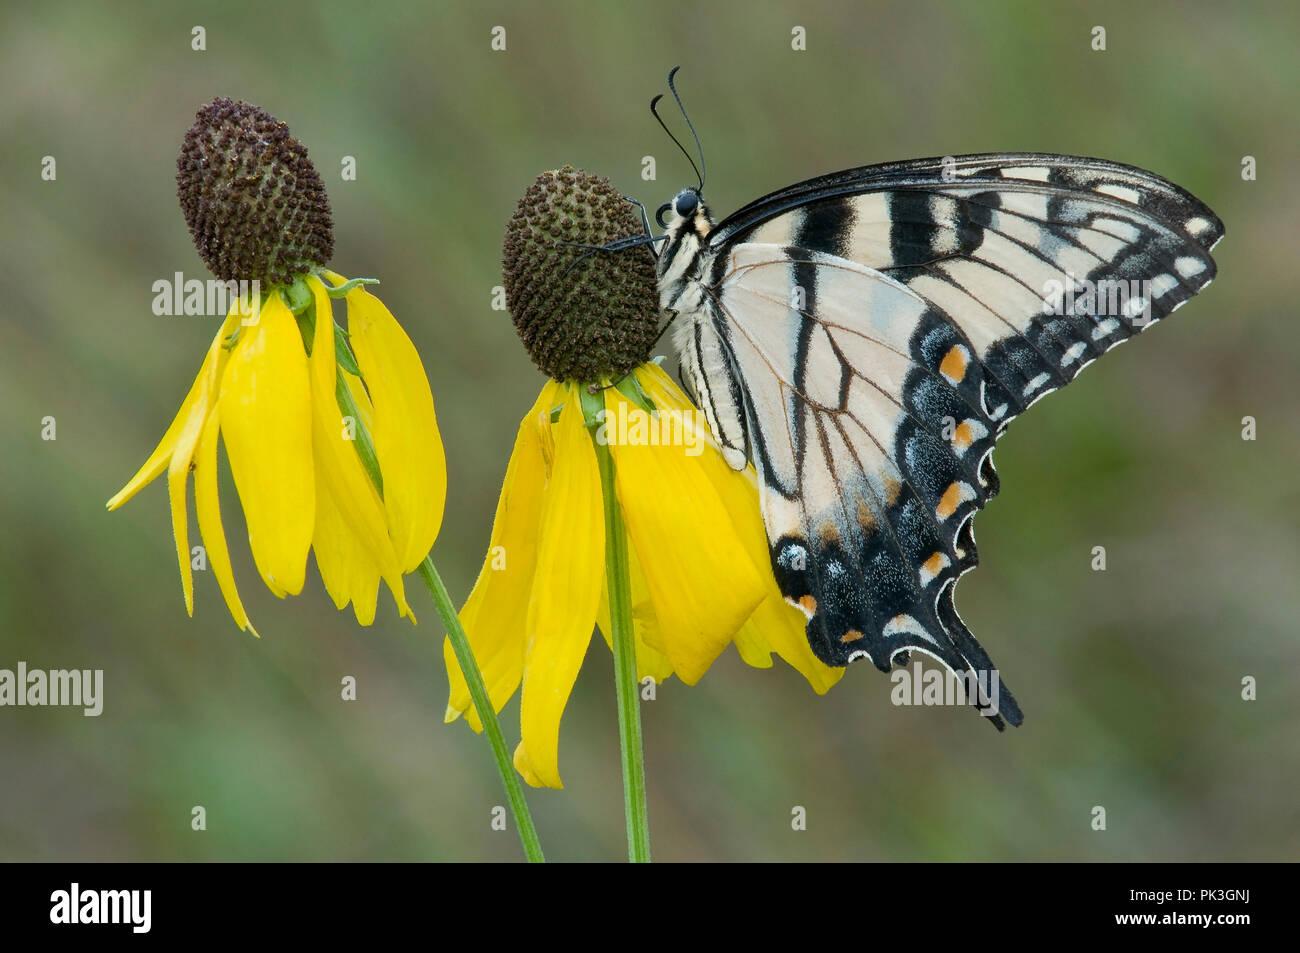 Tigre oriental especie Butterfly (Papilio glaucus) de cabeza gris (Ratibida Coneflower pinnata), E EE.UU., por omitir Moody/Dembinsky Foto Assoc Foto de stock